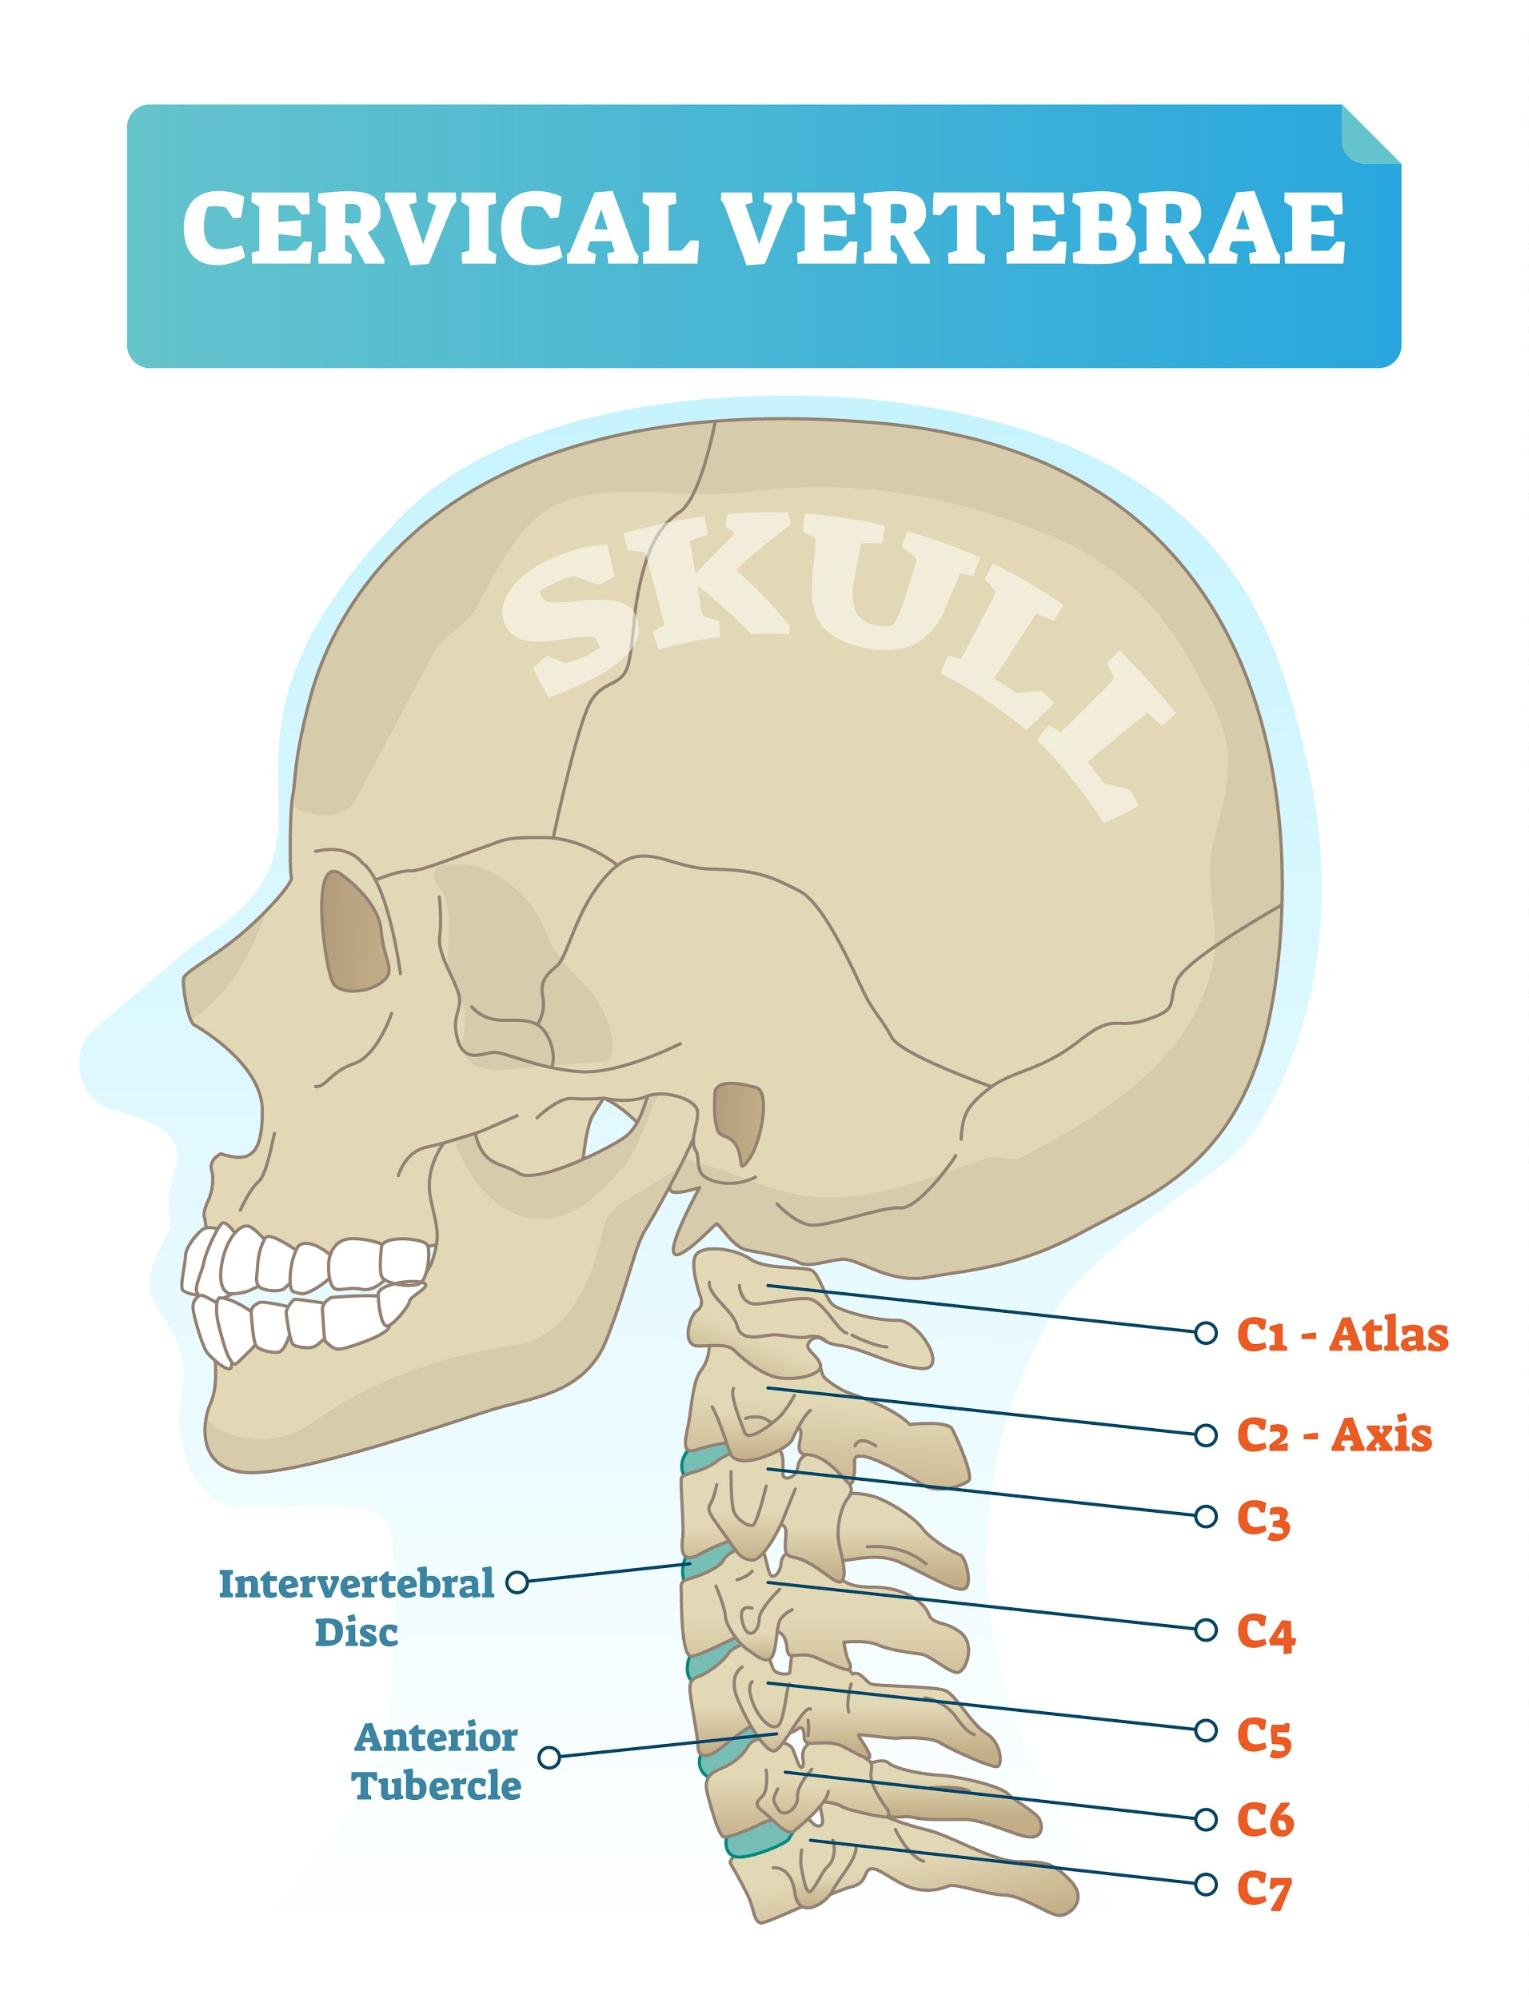 Diagram of the cervical vertebrae